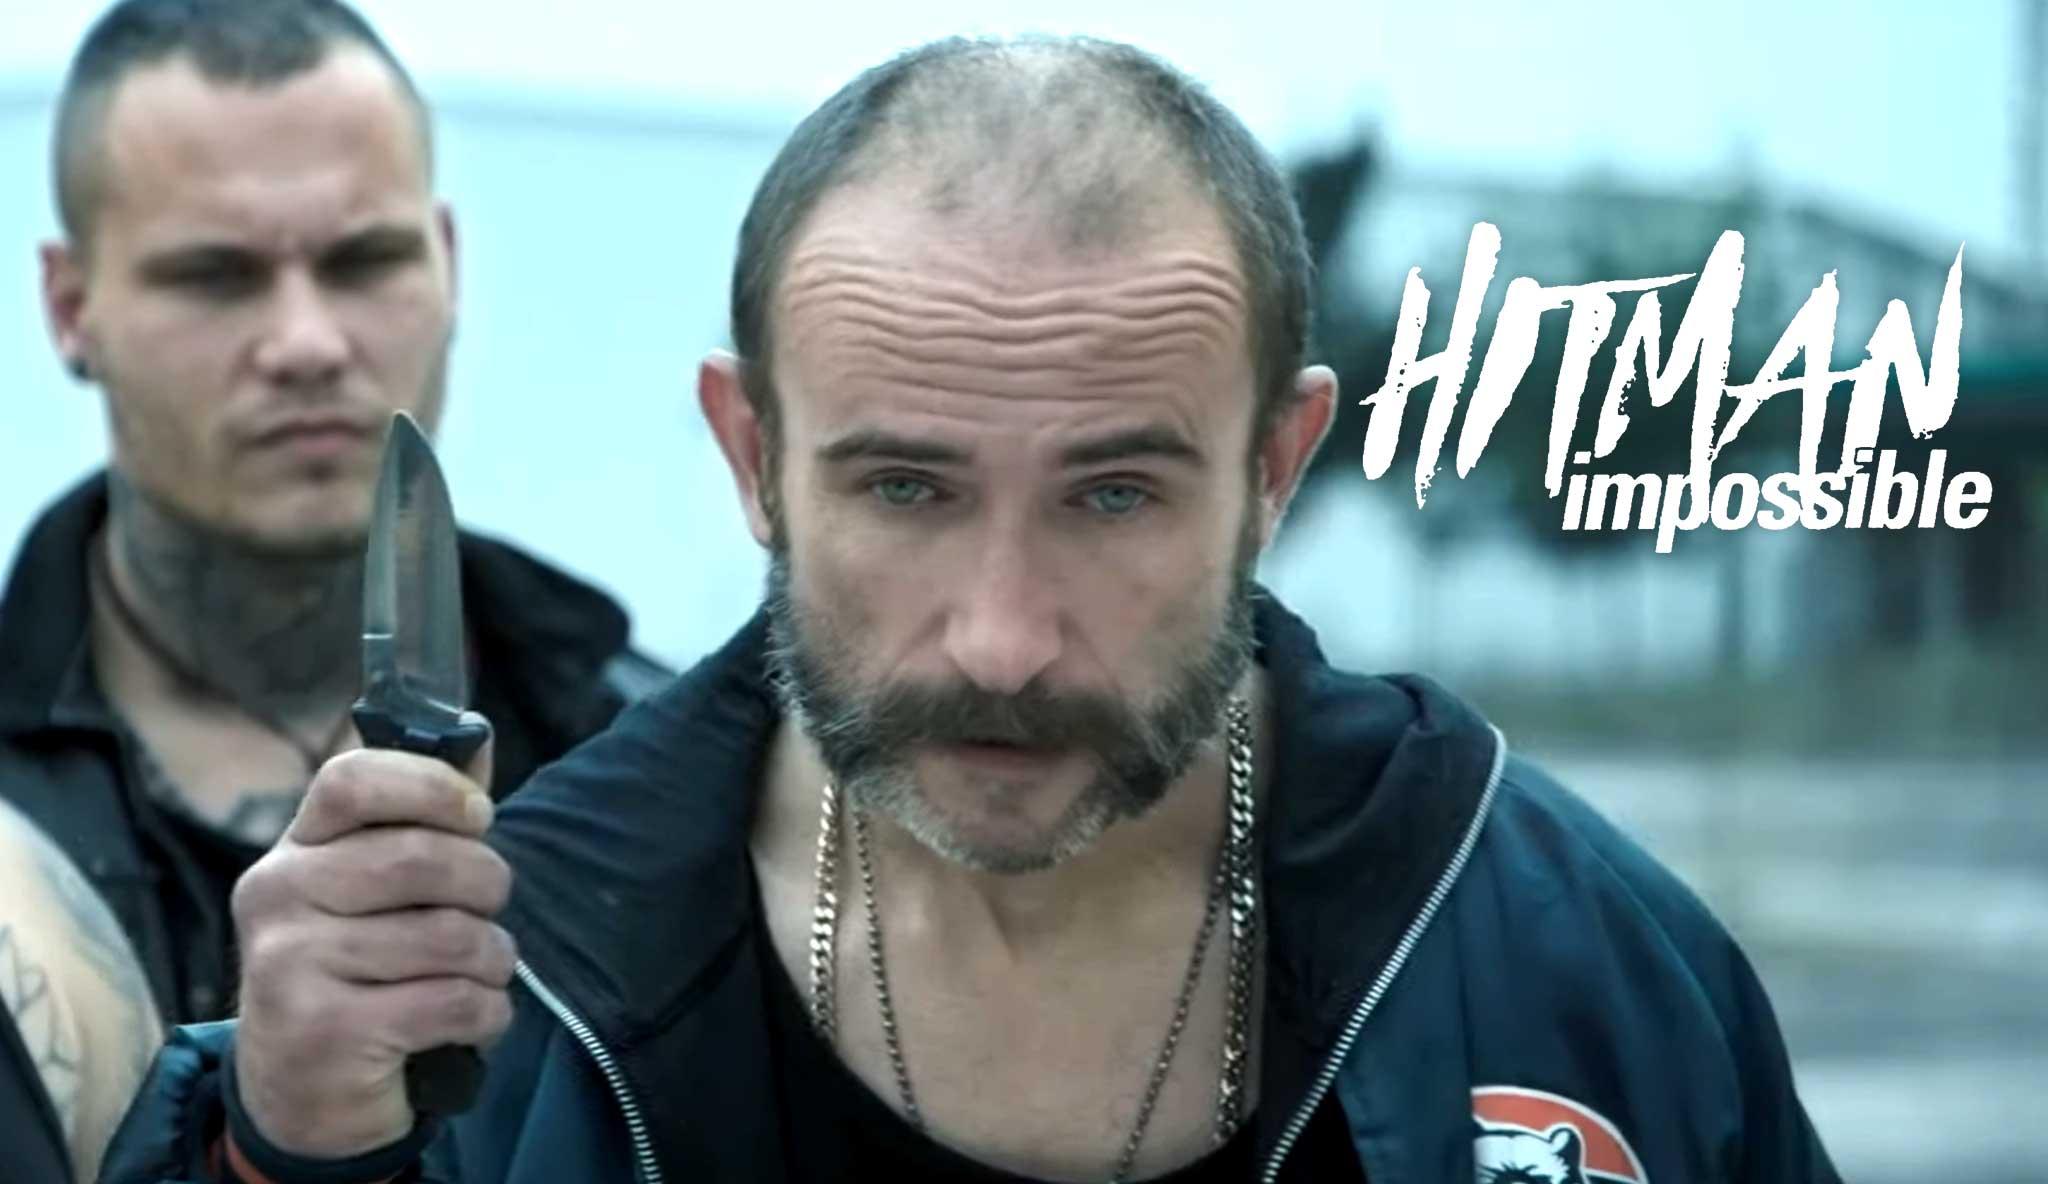 hitman-impossible\header.jpg